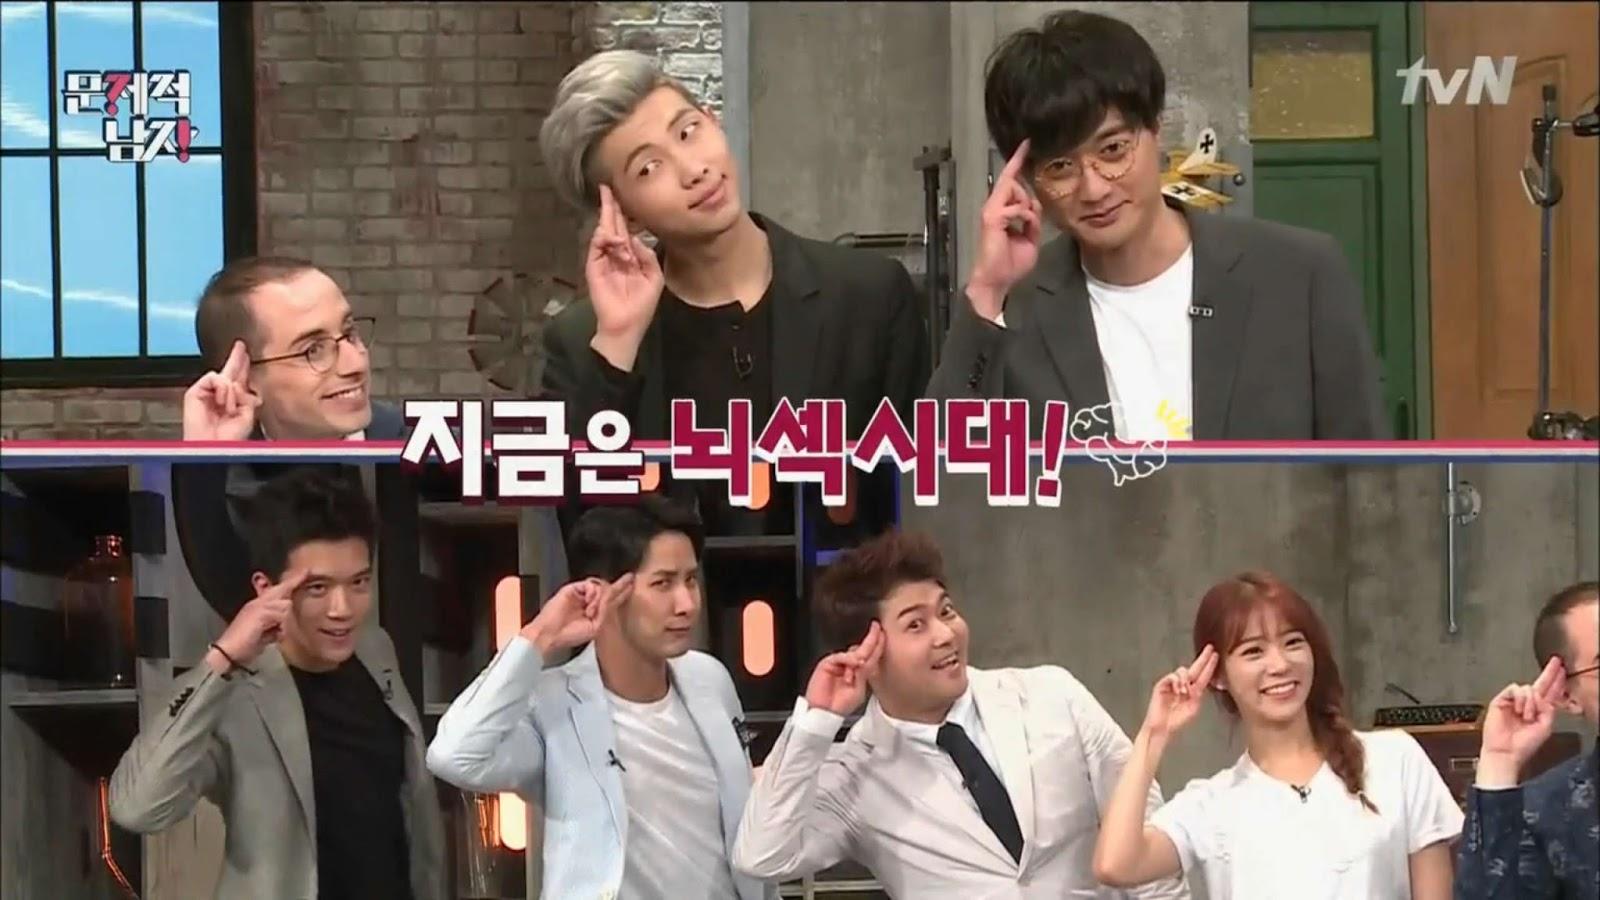 Enjoy Korea with Hui: Problematic Men EP.14 Questions (Brain Warm-ups) with  Han Seung-yeon of Kara